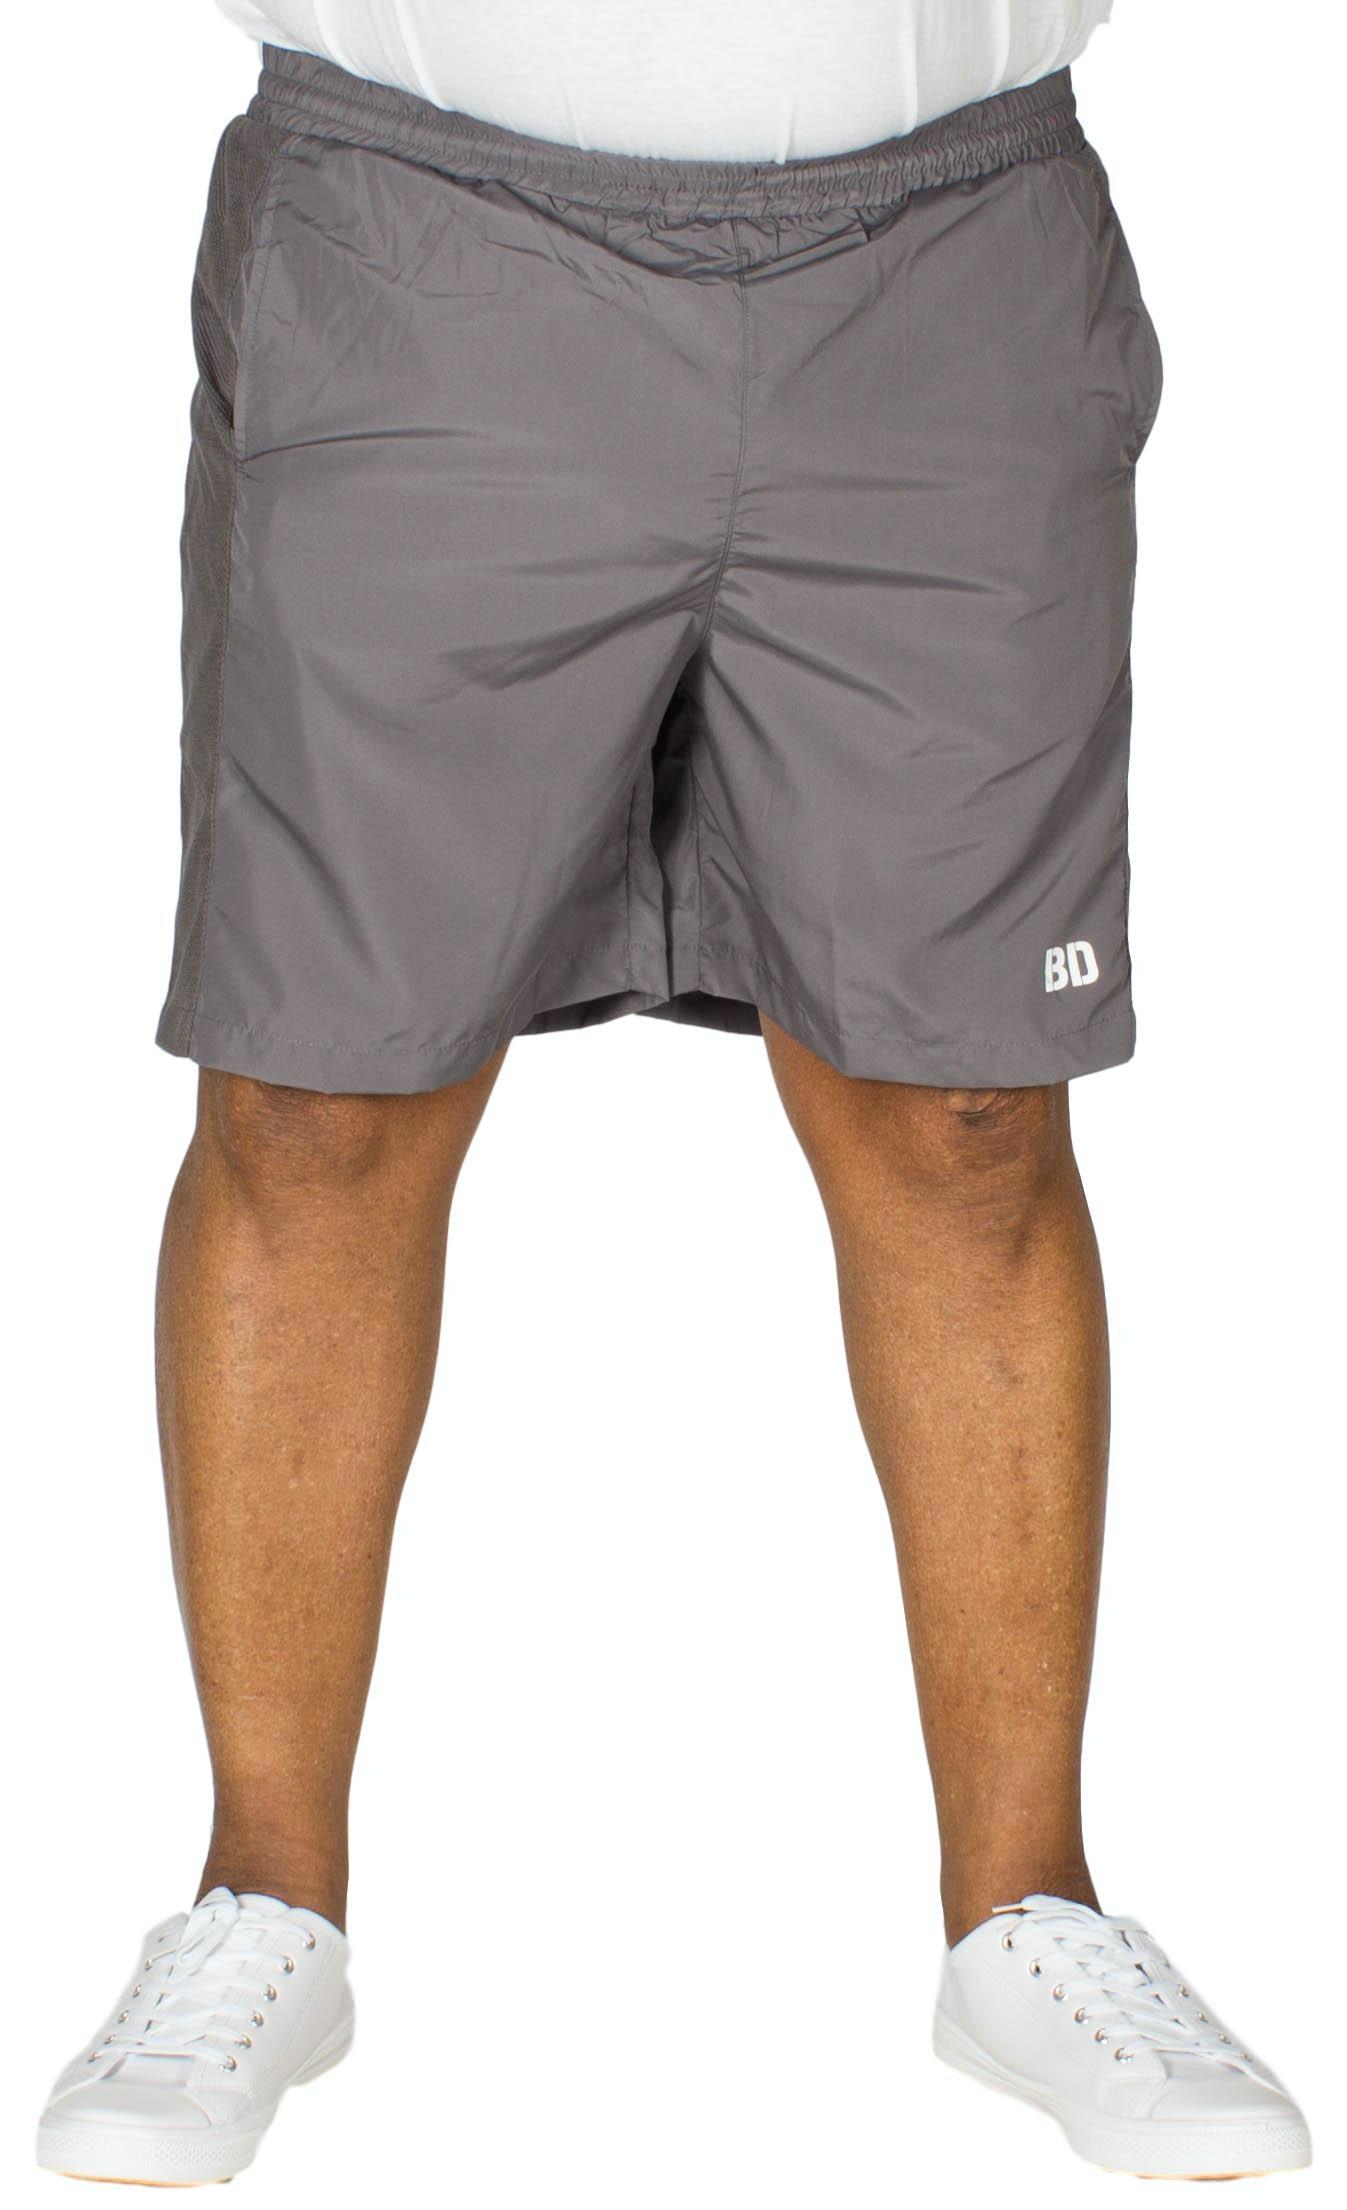 Bigdude Mesh Panel Gym Shorts Charcoal